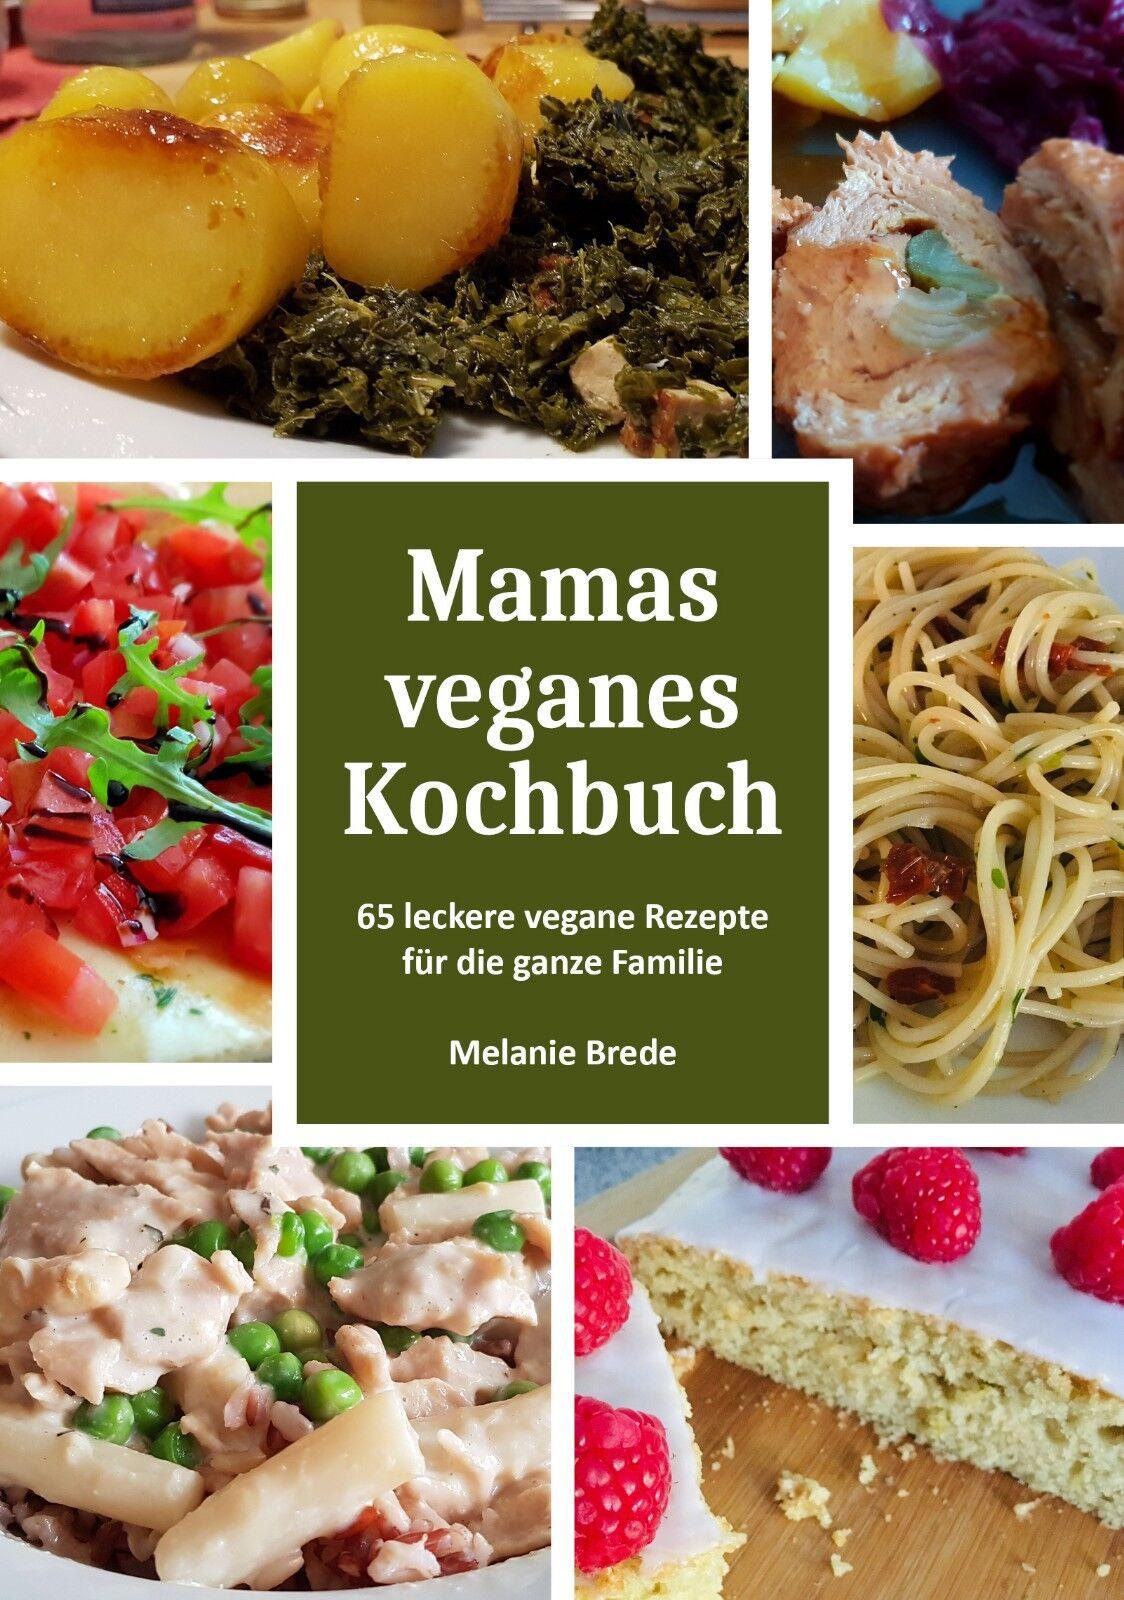 Mamas veganes Kochbuch - 65 leckere vegane Rezepte für die ganze Familie